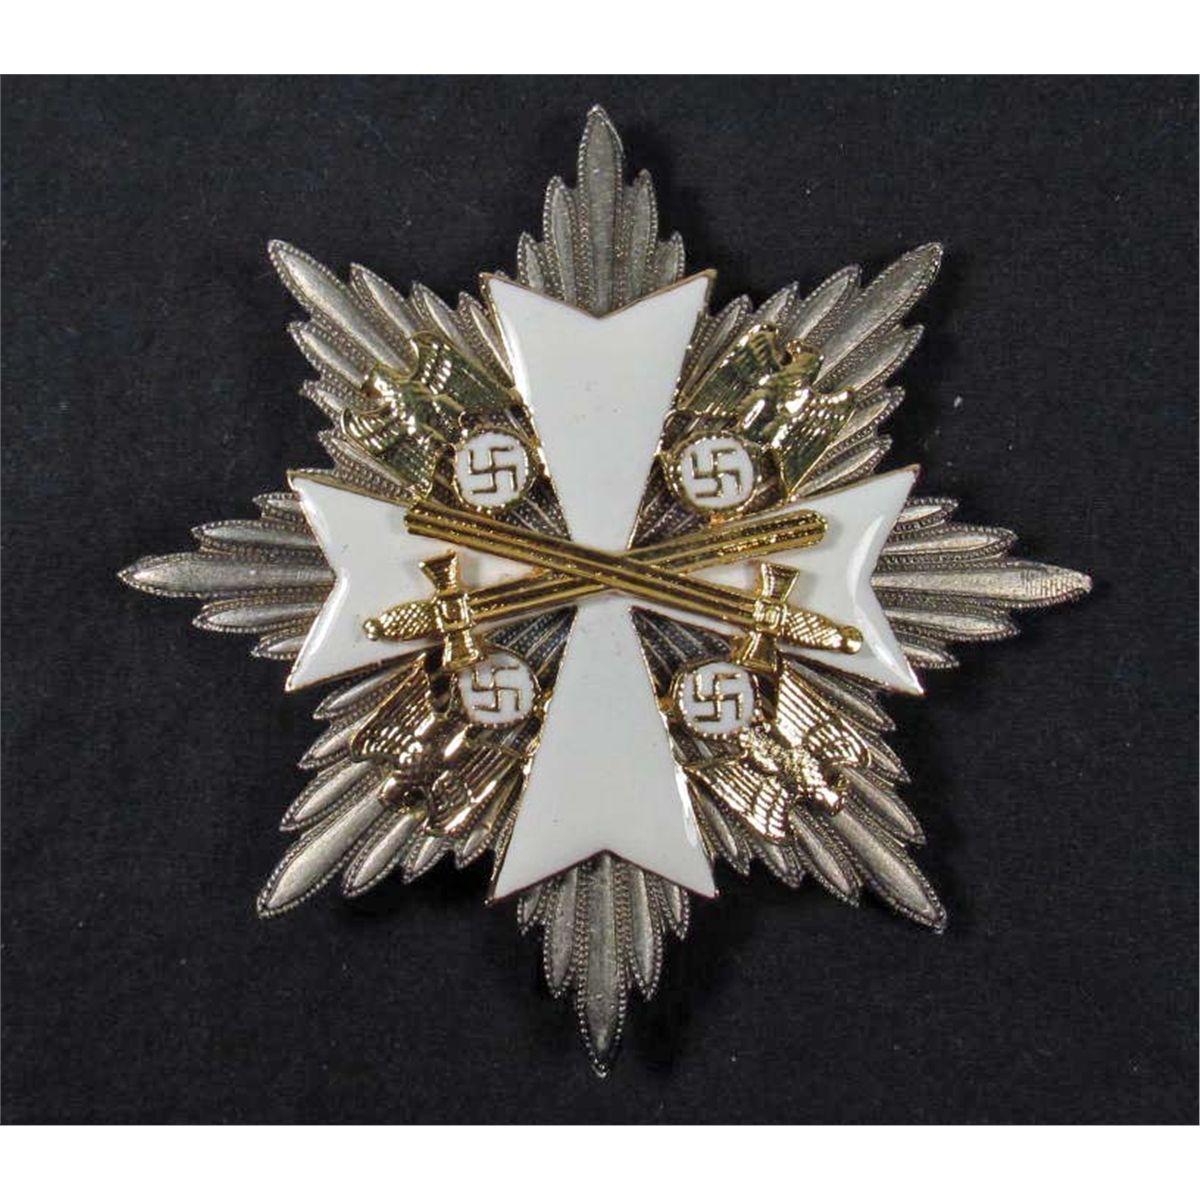 GERMAN NAZI ORDER OF THE GERMAN EAGLE BADGE